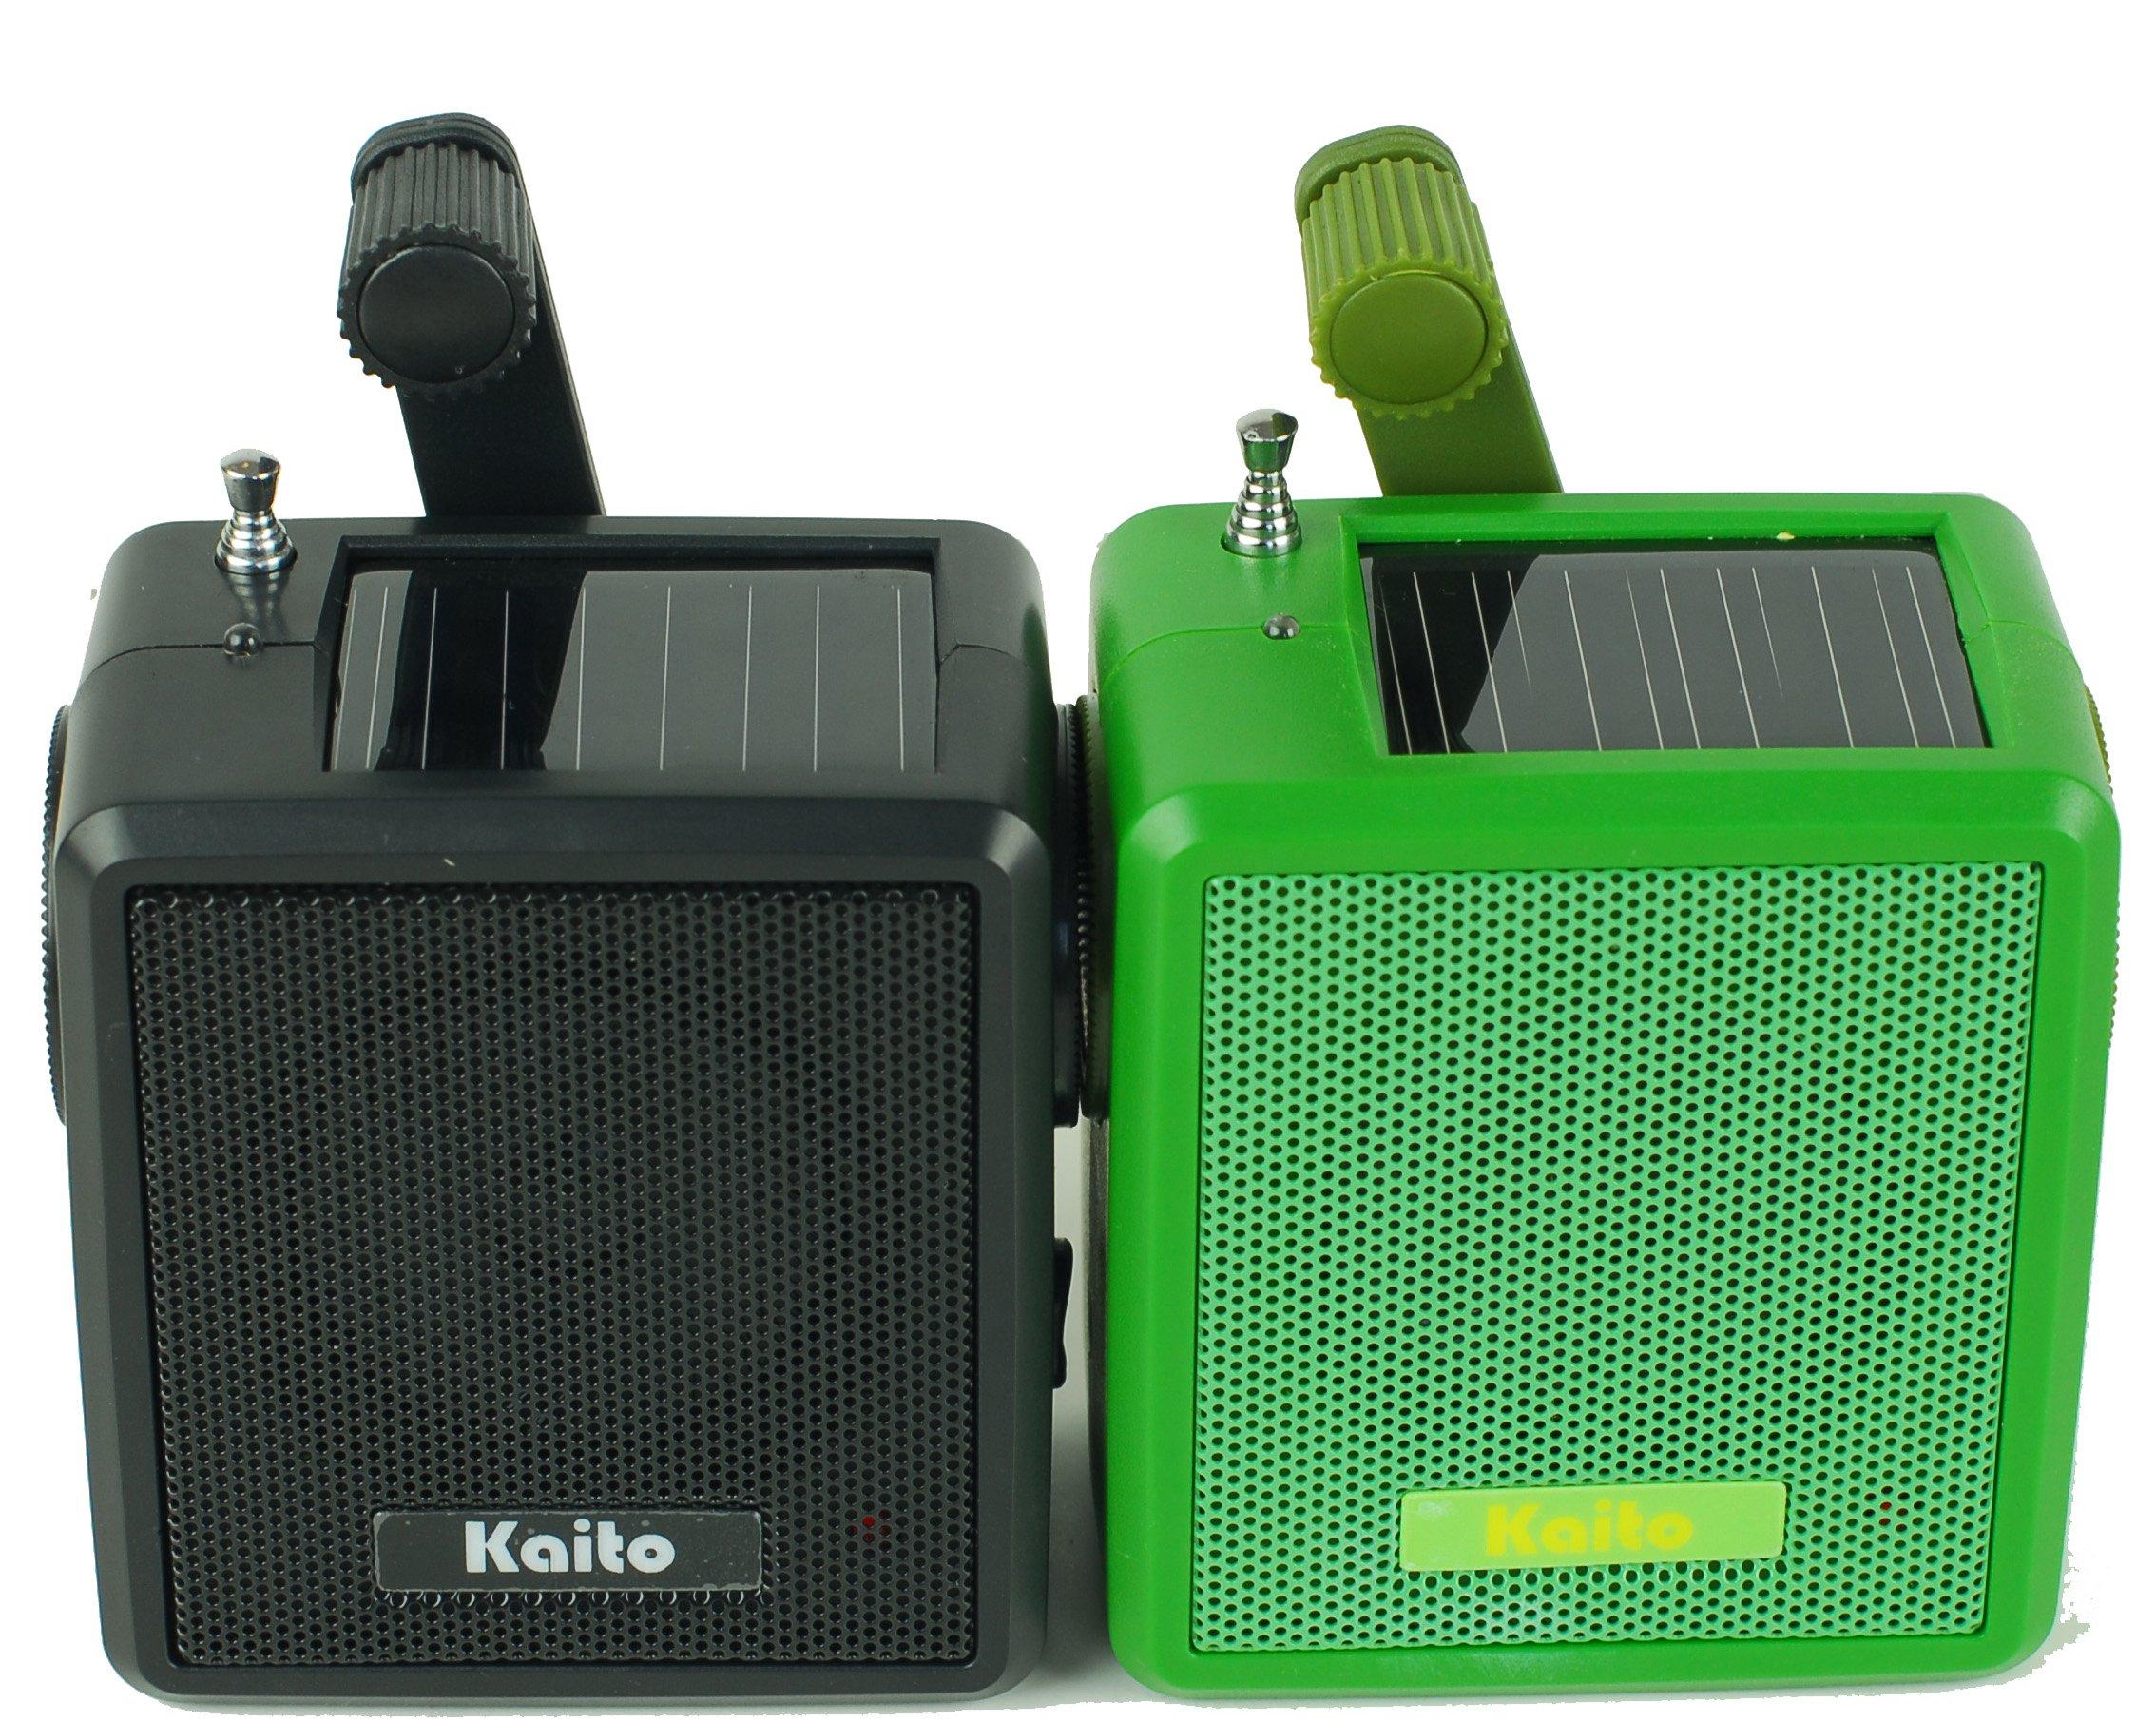 Kaito SB-1059 Mini Hand Crank AM/FM Weather Radio, Green